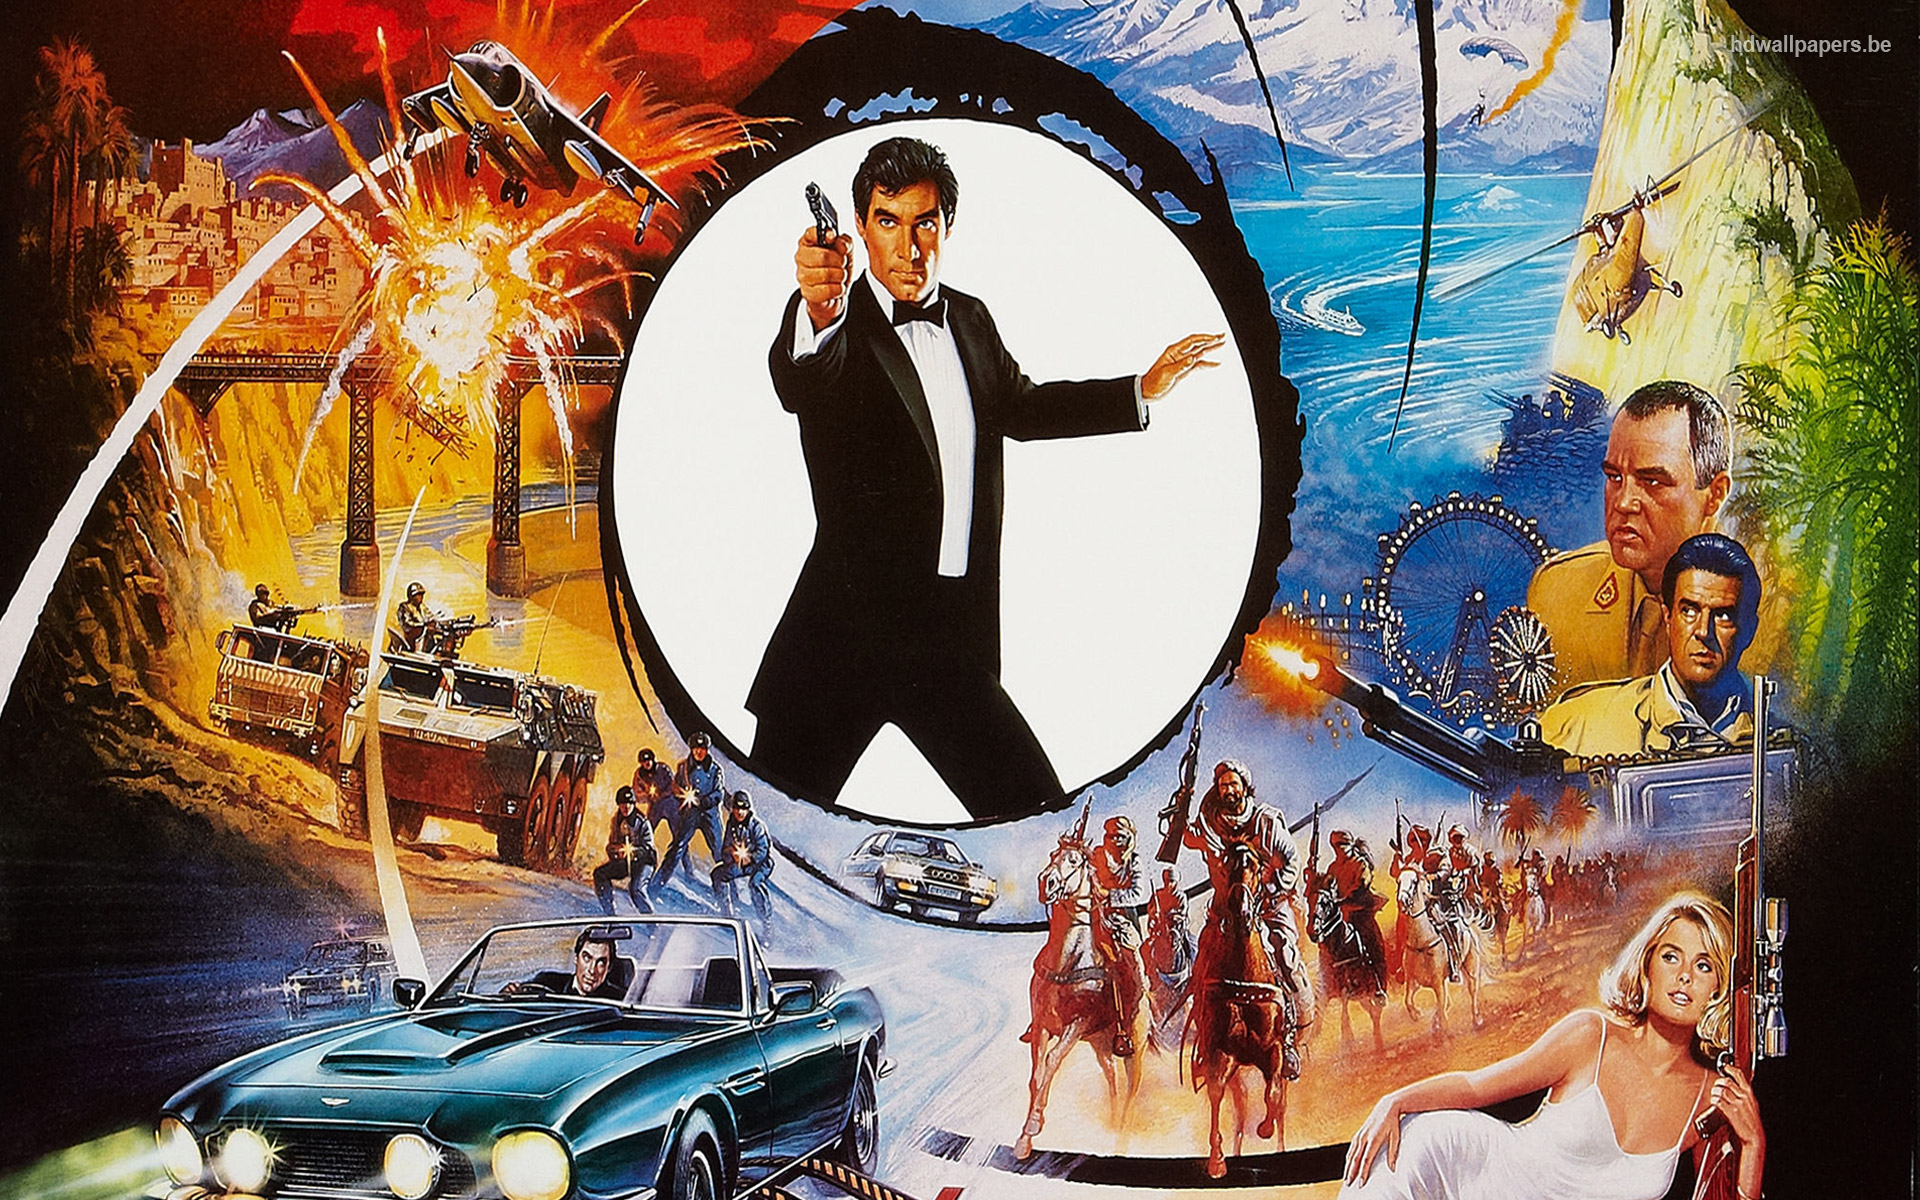 James bond movie poster wallpaper wallpapersafari - Movie poster wallpaper ...